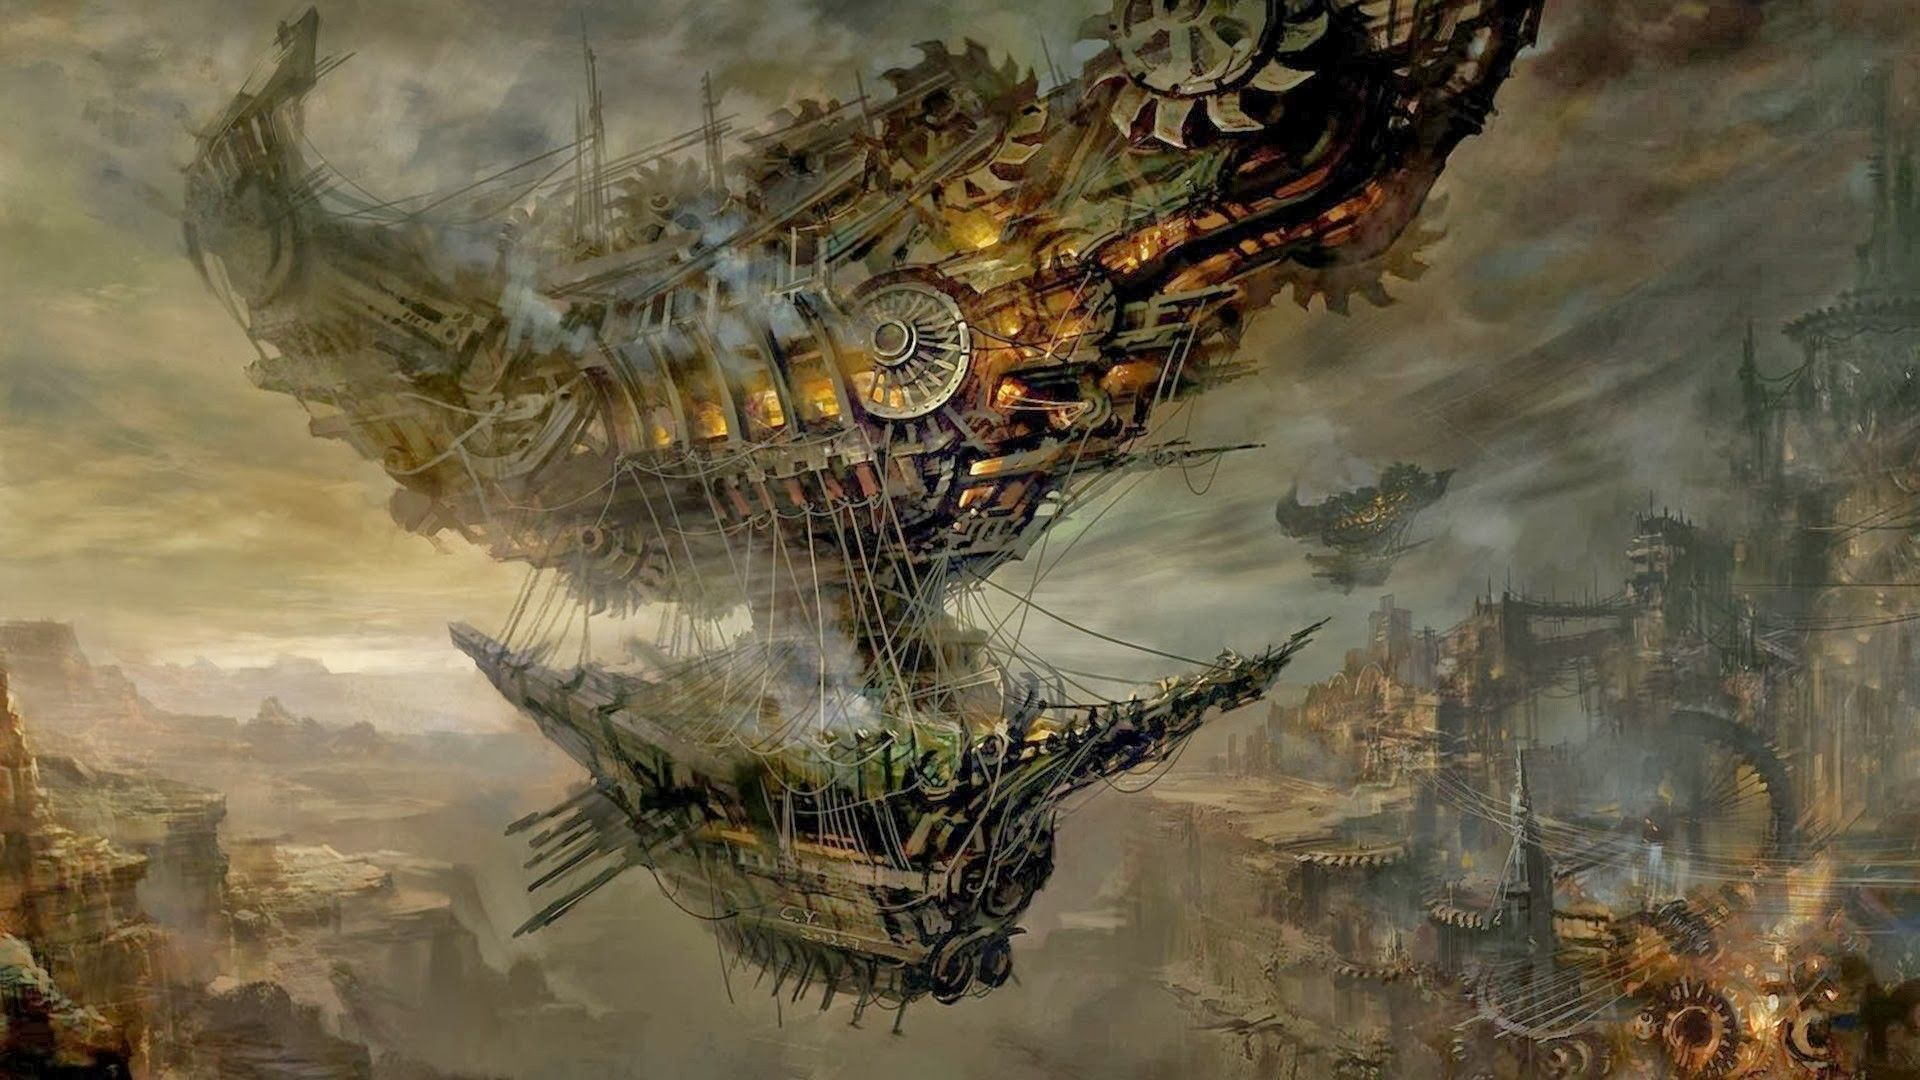 Wallpaper Of Budapest, Fantasi, Kota Fantasi, Game Mitologi, Airships, Share